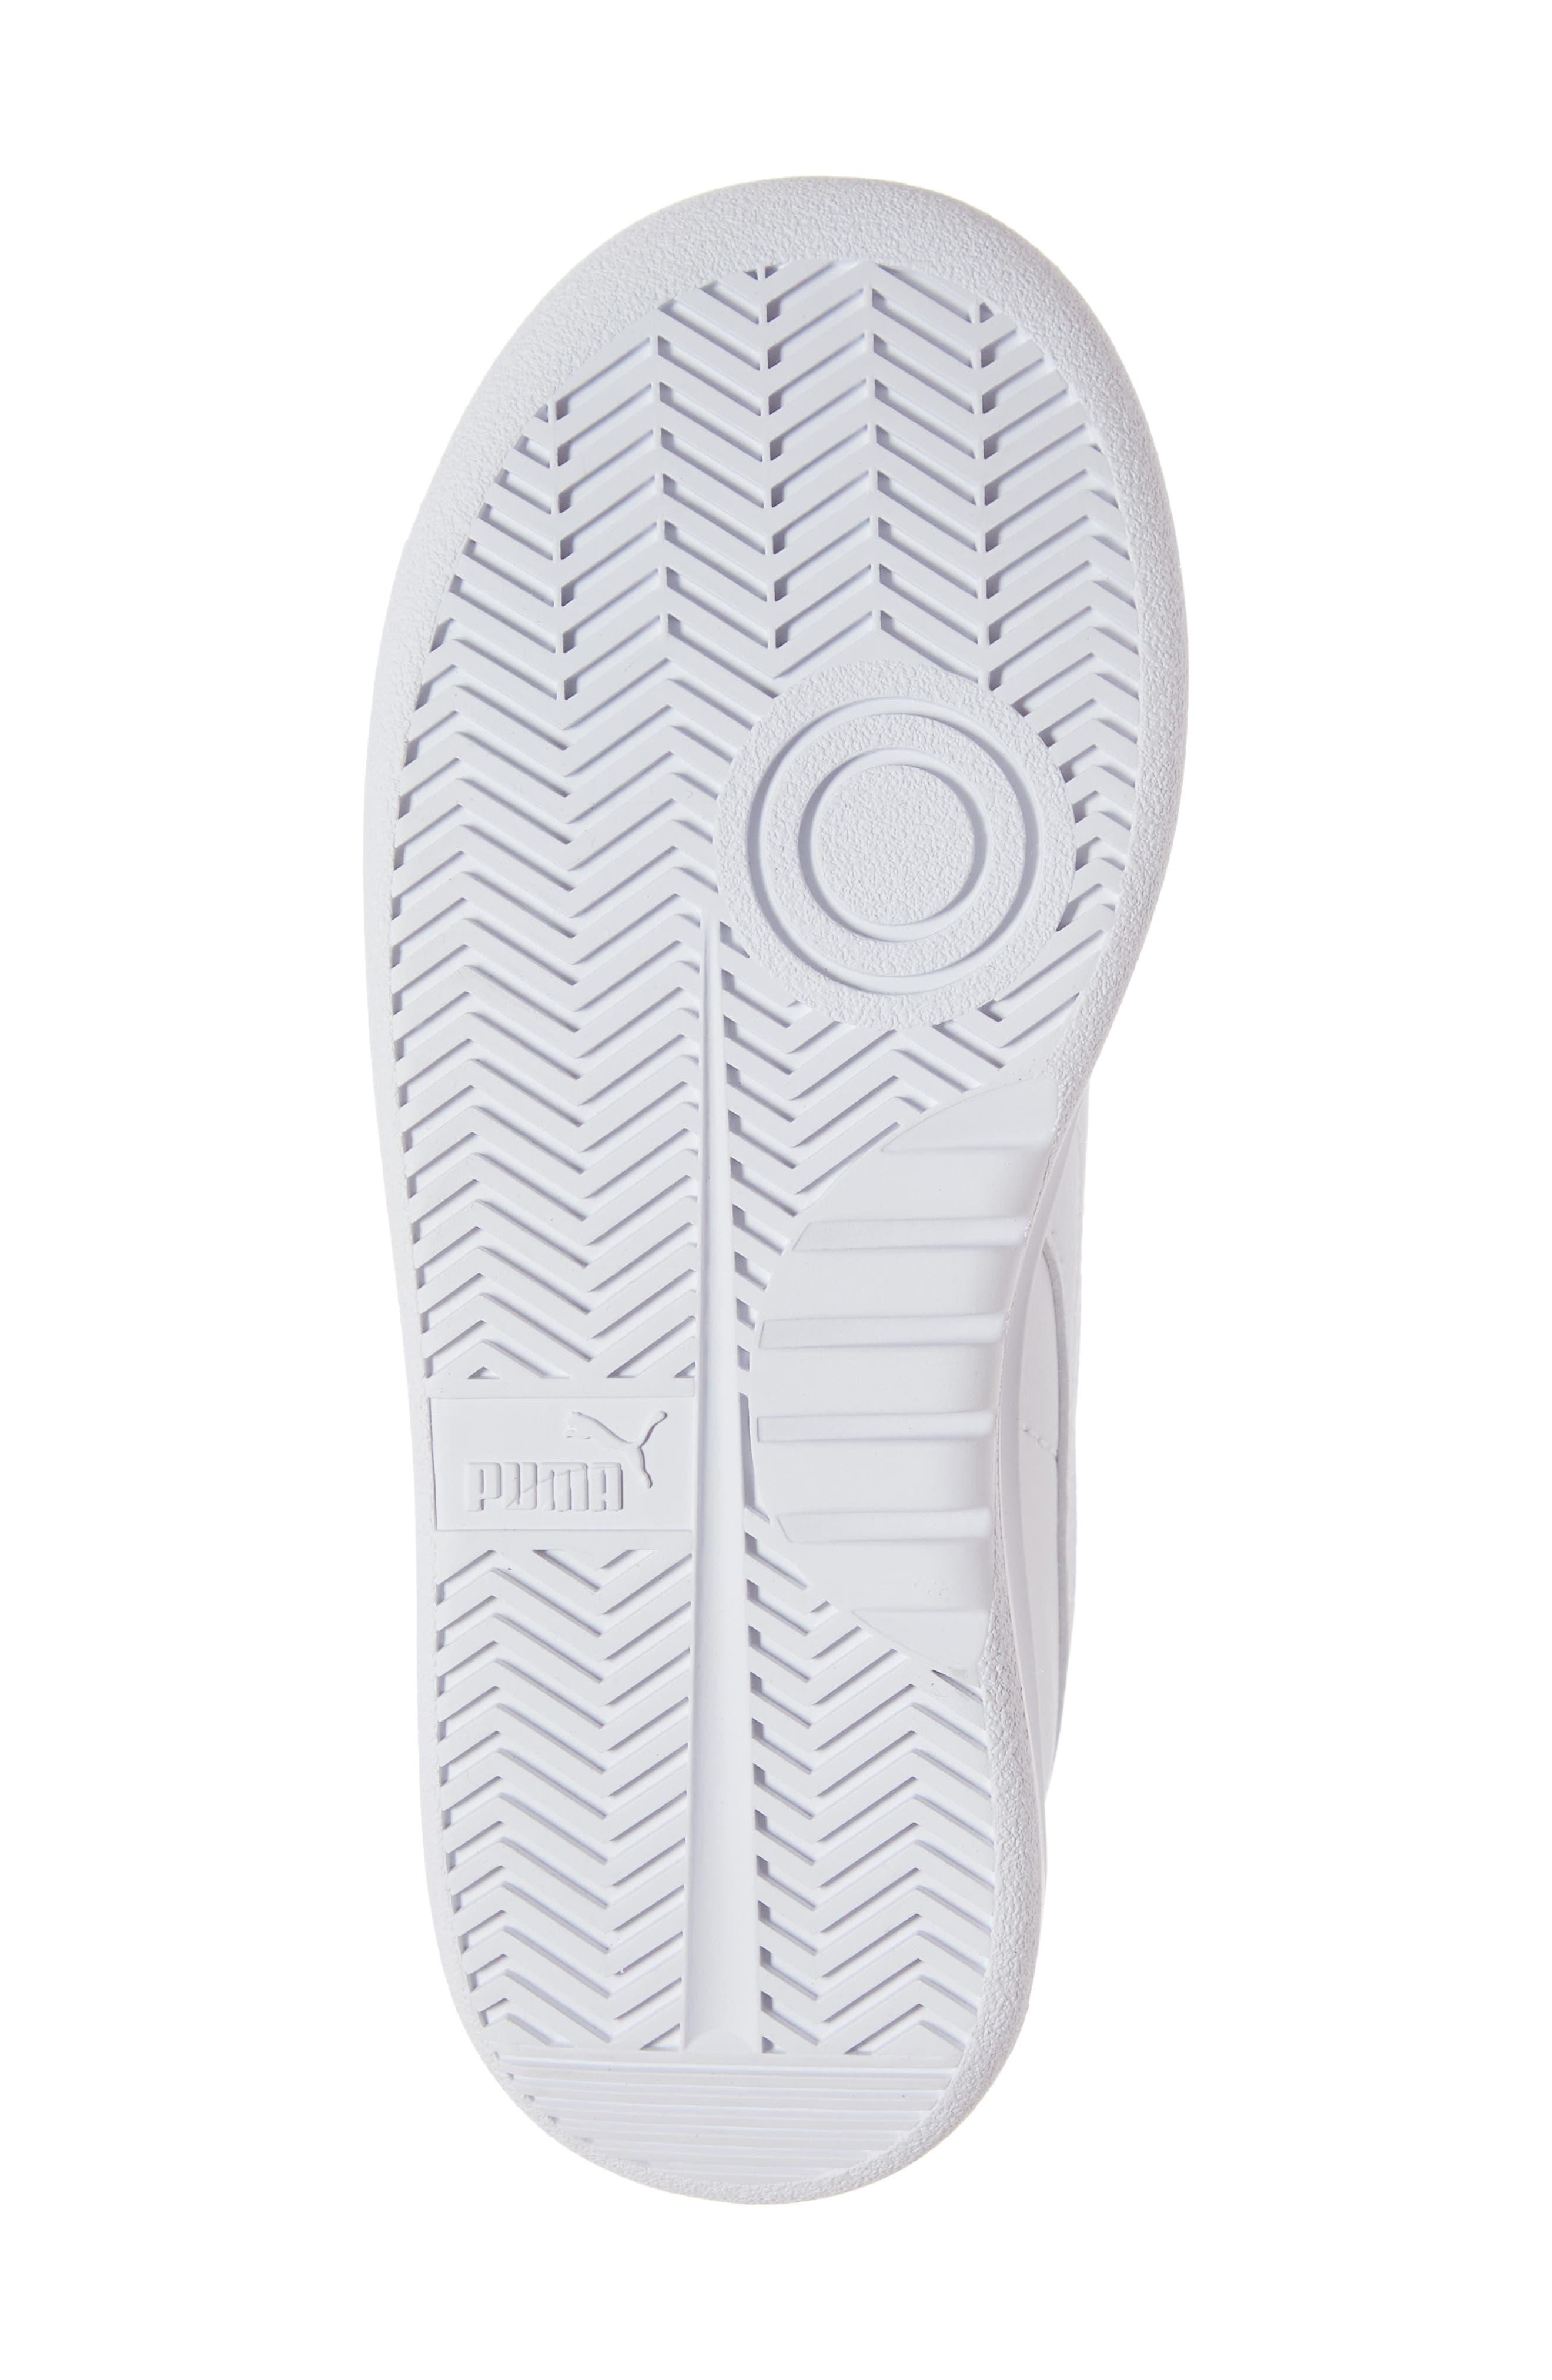 PUMA, 'GV Special' Sneaker, Alternate thumbnail 6, color, PUMA WHITE-PUMA TEAM GOLD